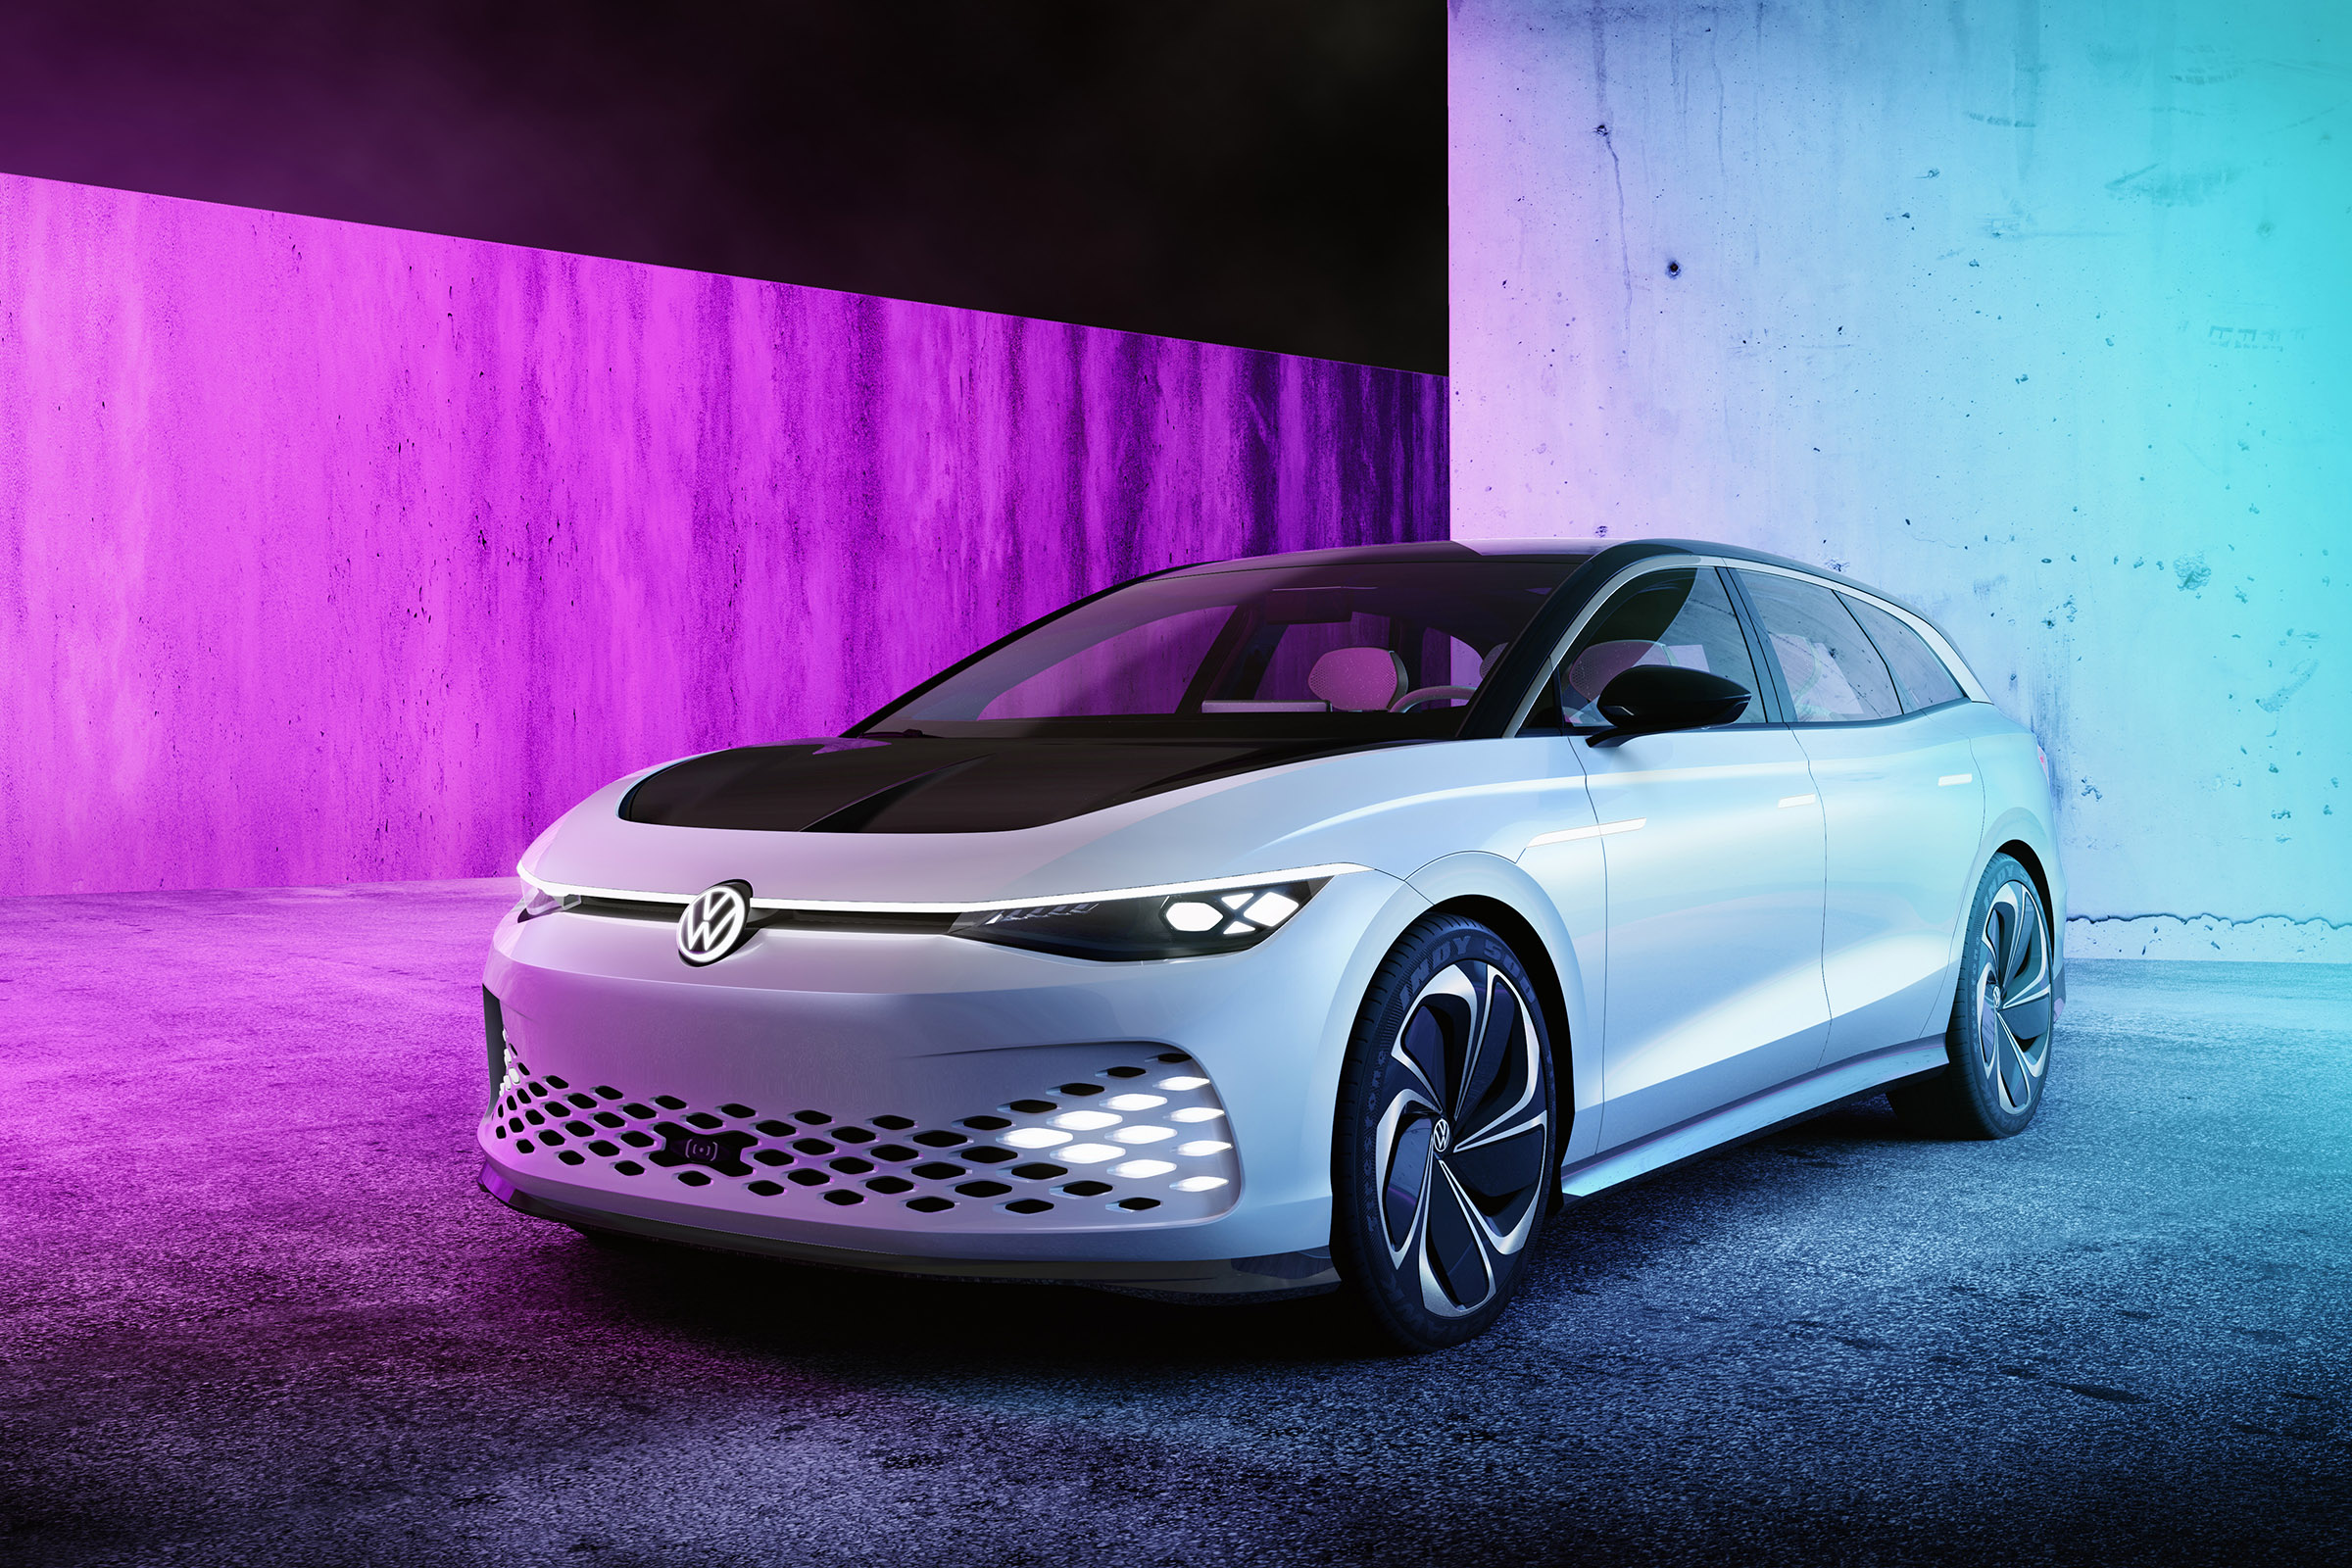 2021 Volkswagen ID. Space Vizzion estate concept launched ...